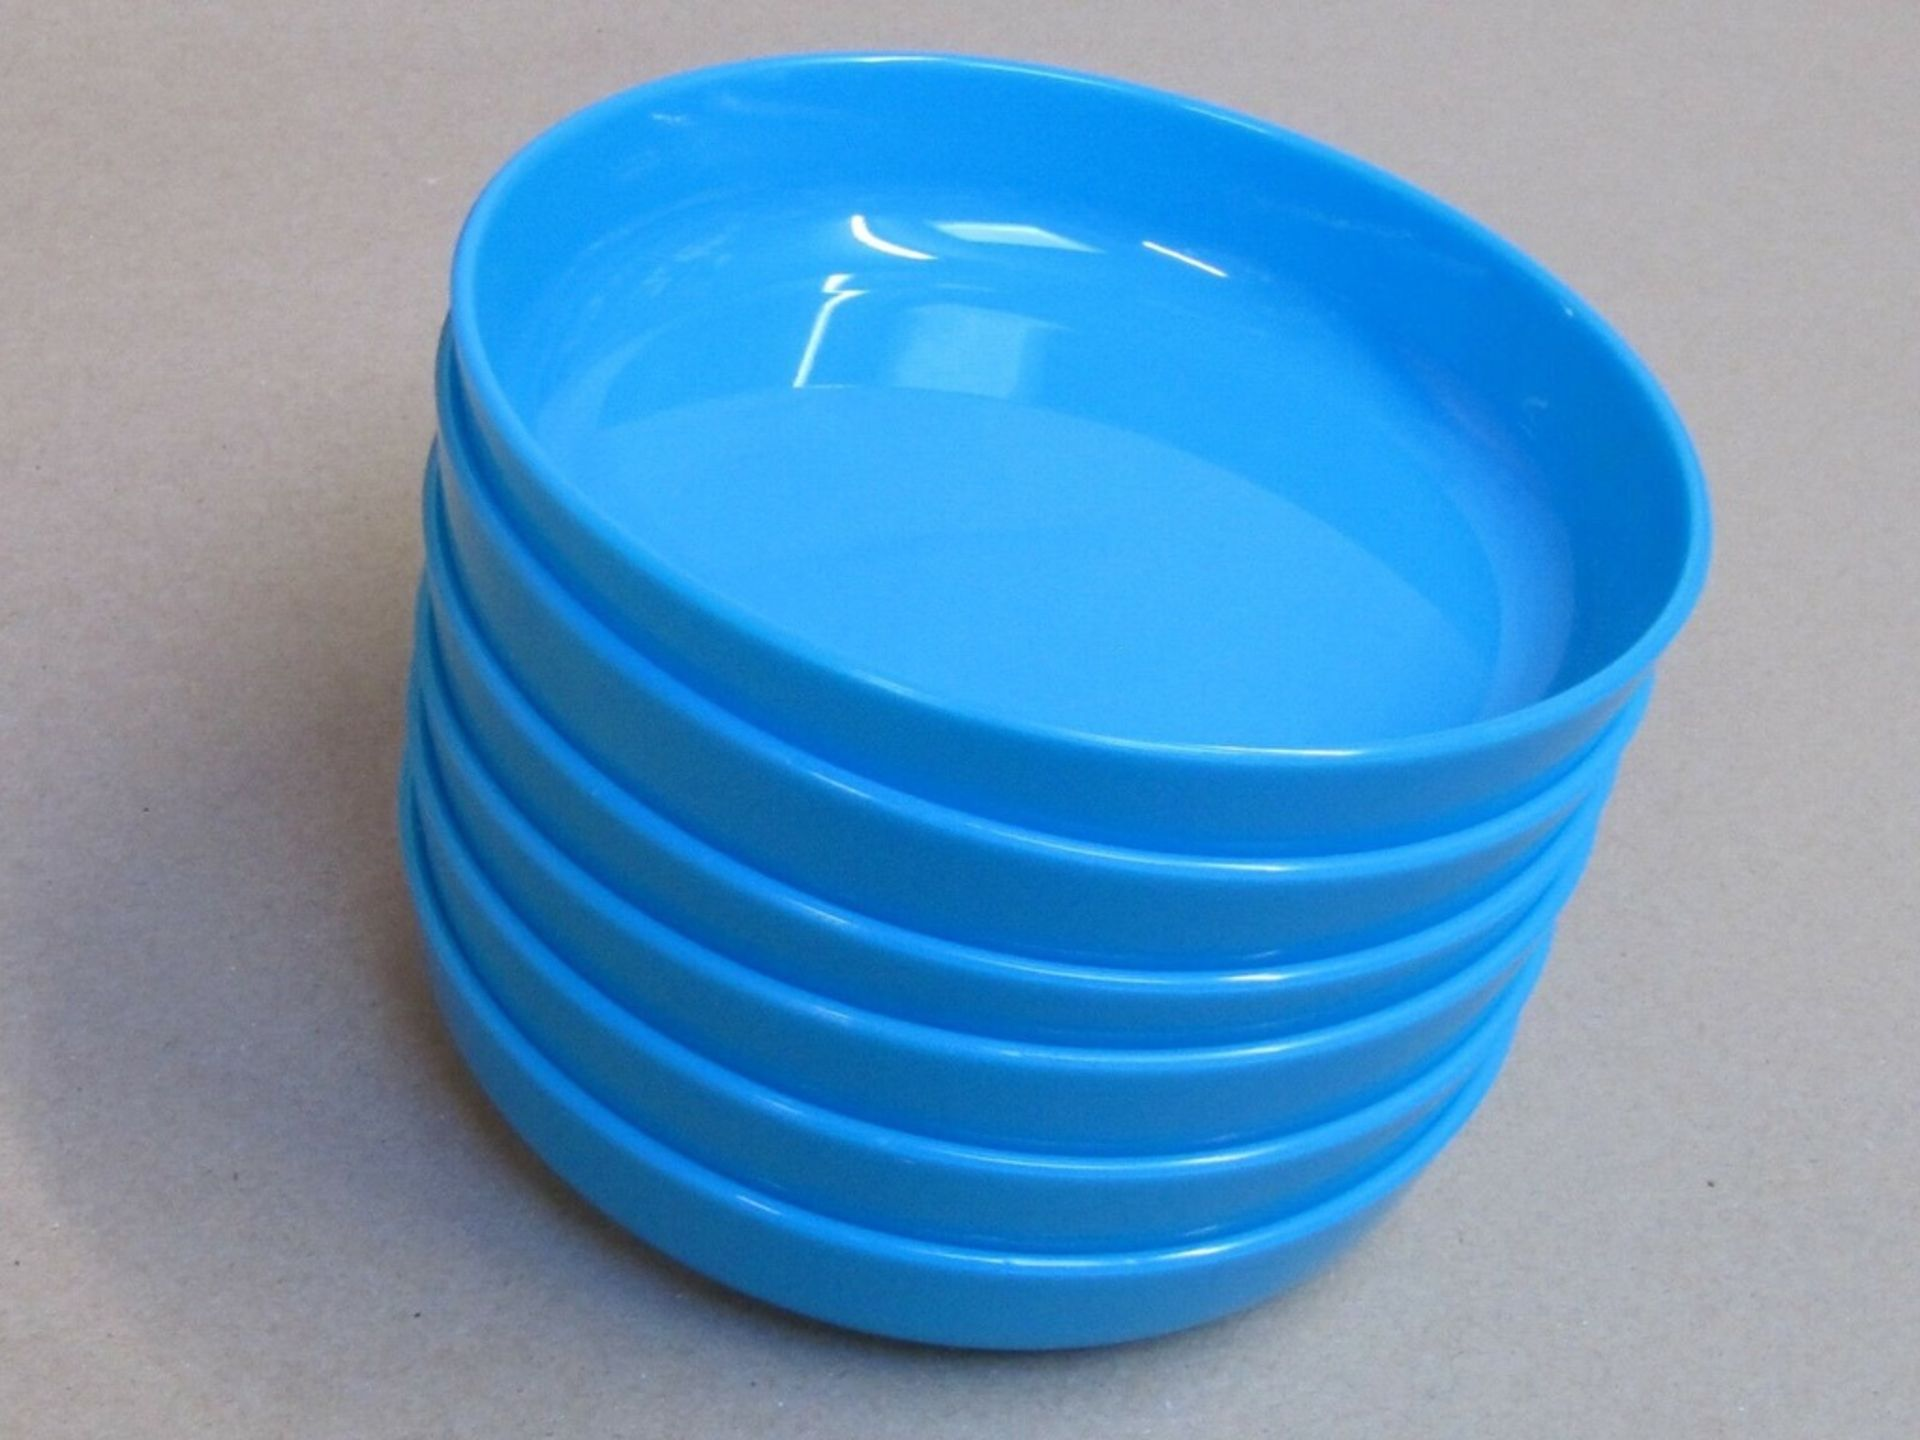 Lot 27 - 30 x Kinderzeug Unbreakable Baby Dessert Bowl Dish washer & Microwave safeno vat on hammer.You will